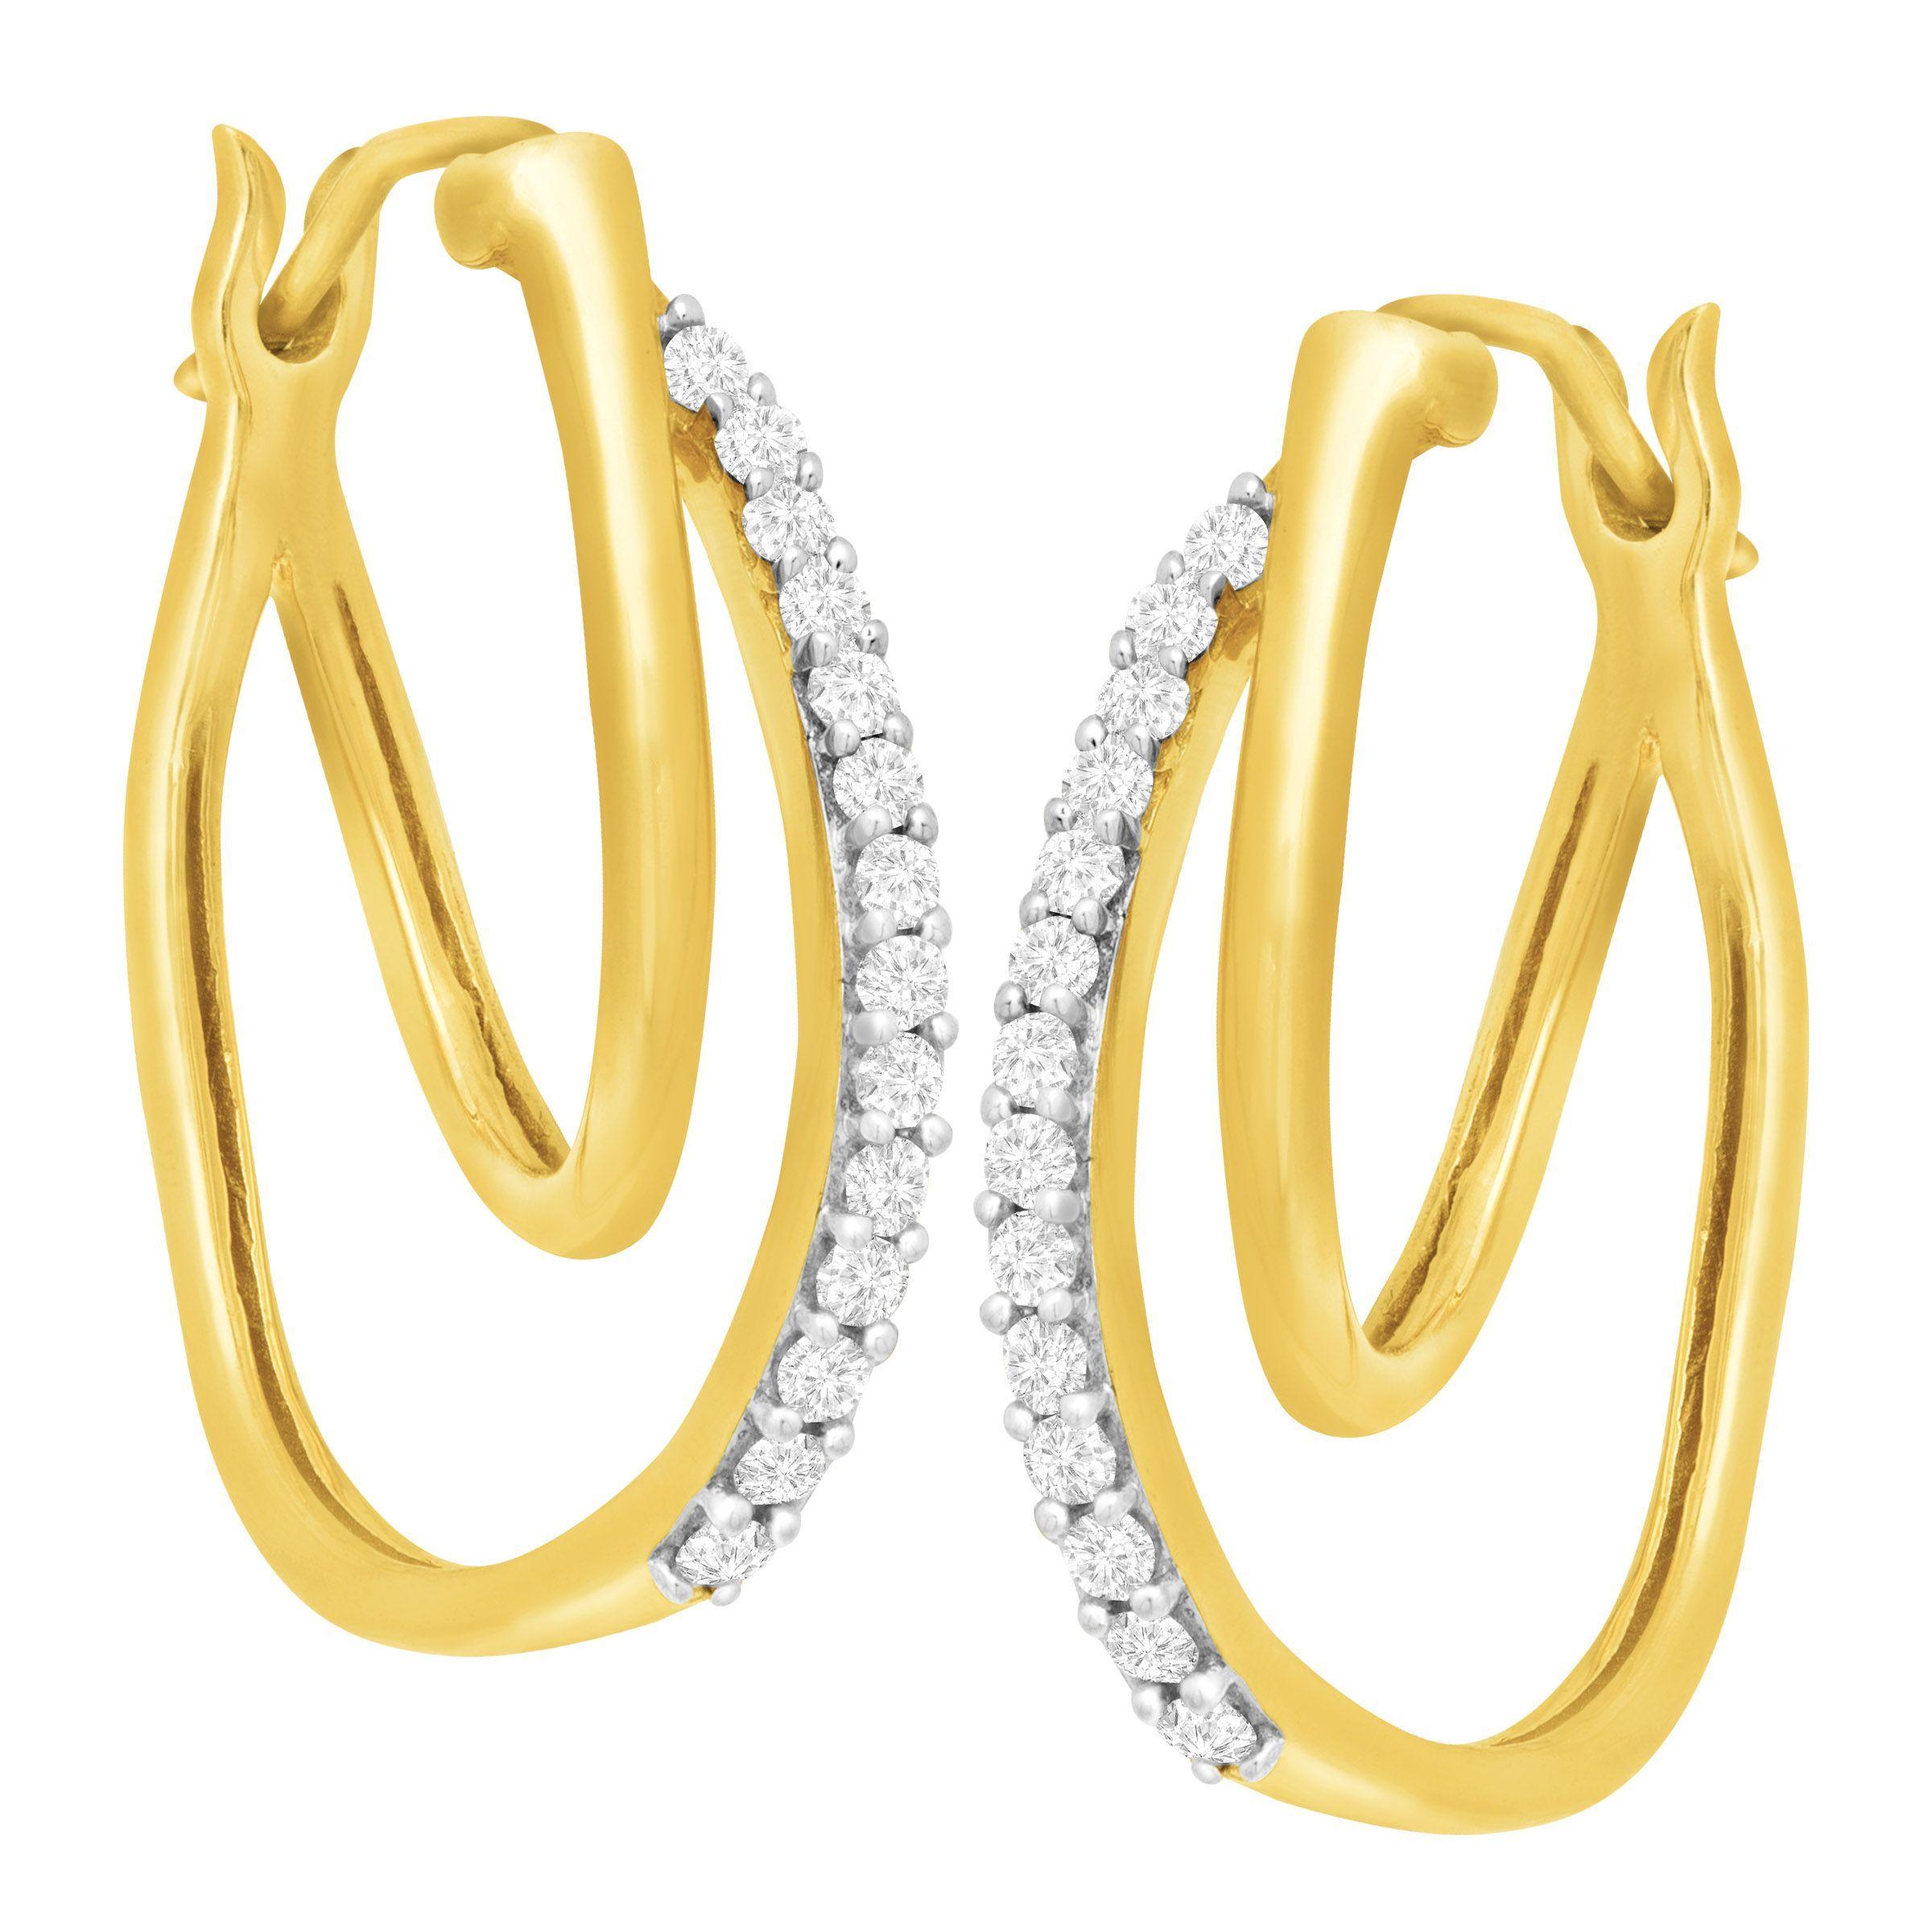 1 4 ct diamond double hoop earrings in 10k gold ebay. Black Bedroom Furniture Sets. Home Design Ideas